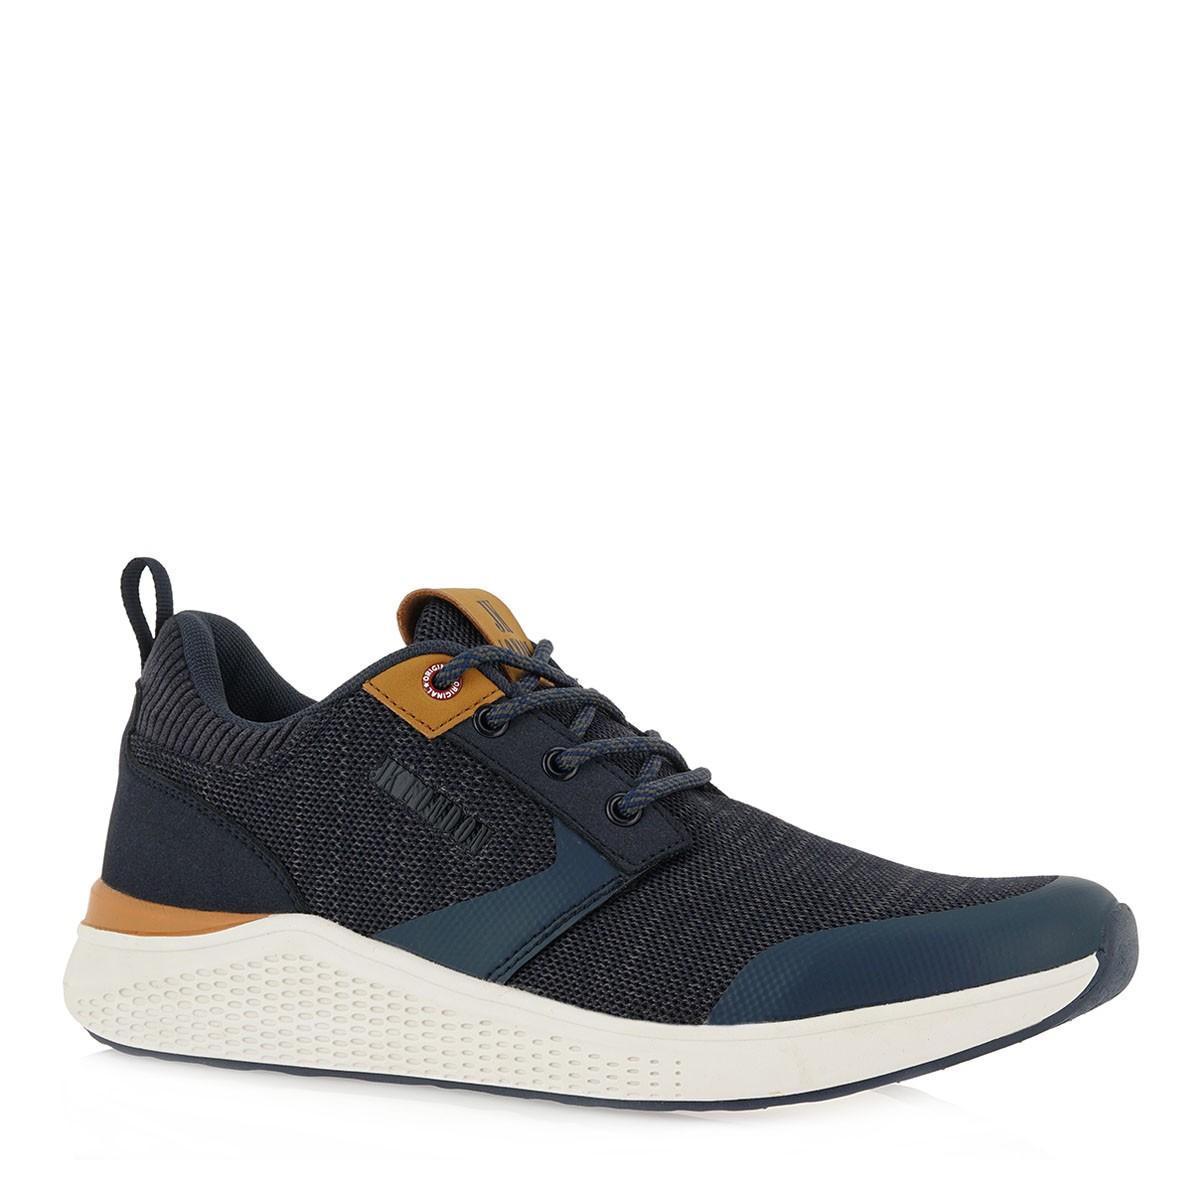 JK LONDON Ανδρικά παπούτσια Sneakers 059-905059Α Μπλέ K585X0441A50